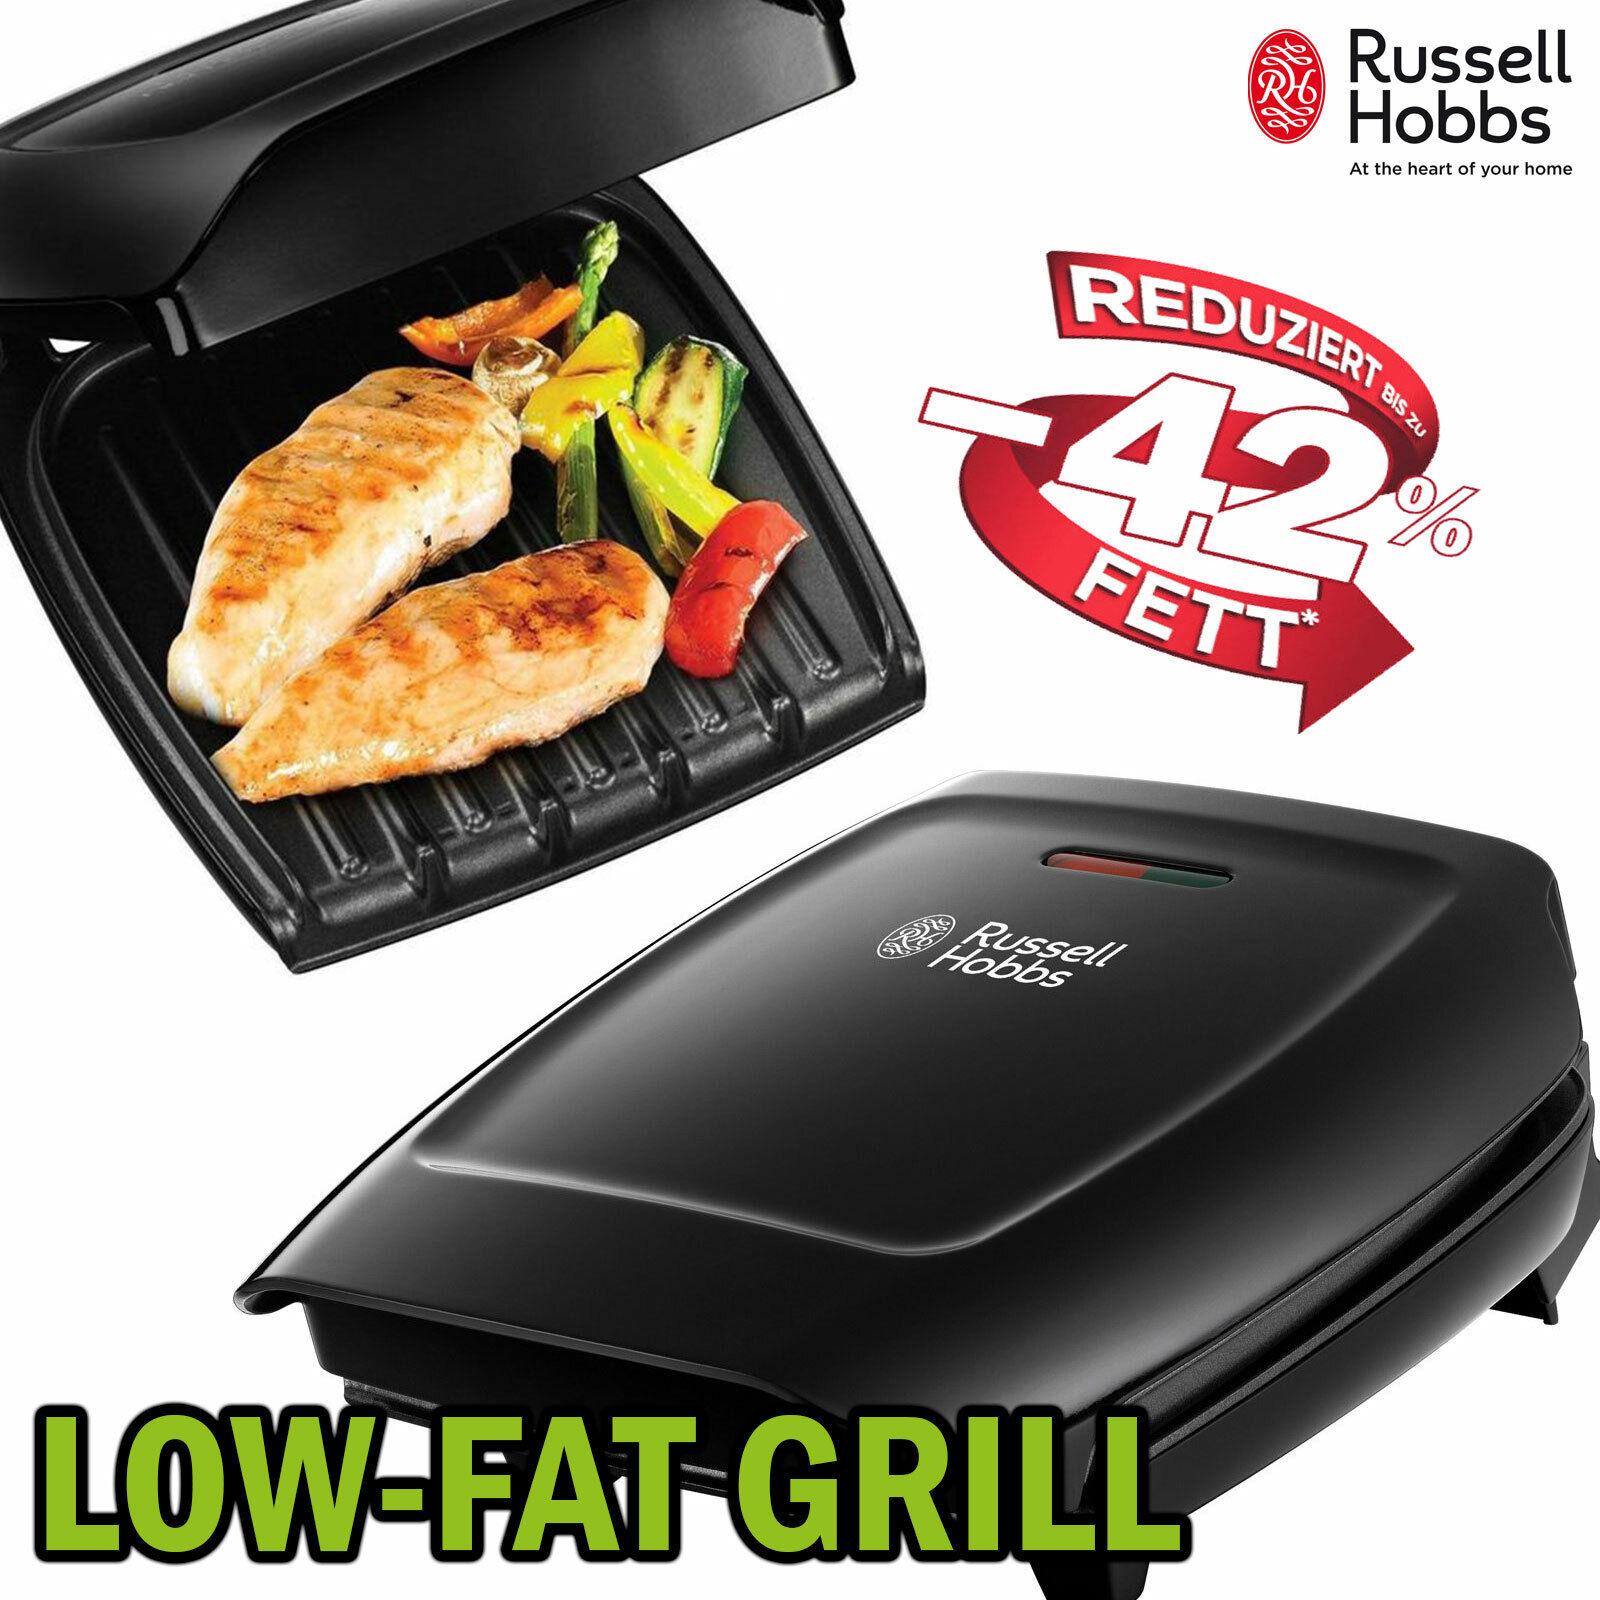 Elektro Grill Tischgrill Sandwich Maker 2in1 Panini Grillplatte Russell Hobbs